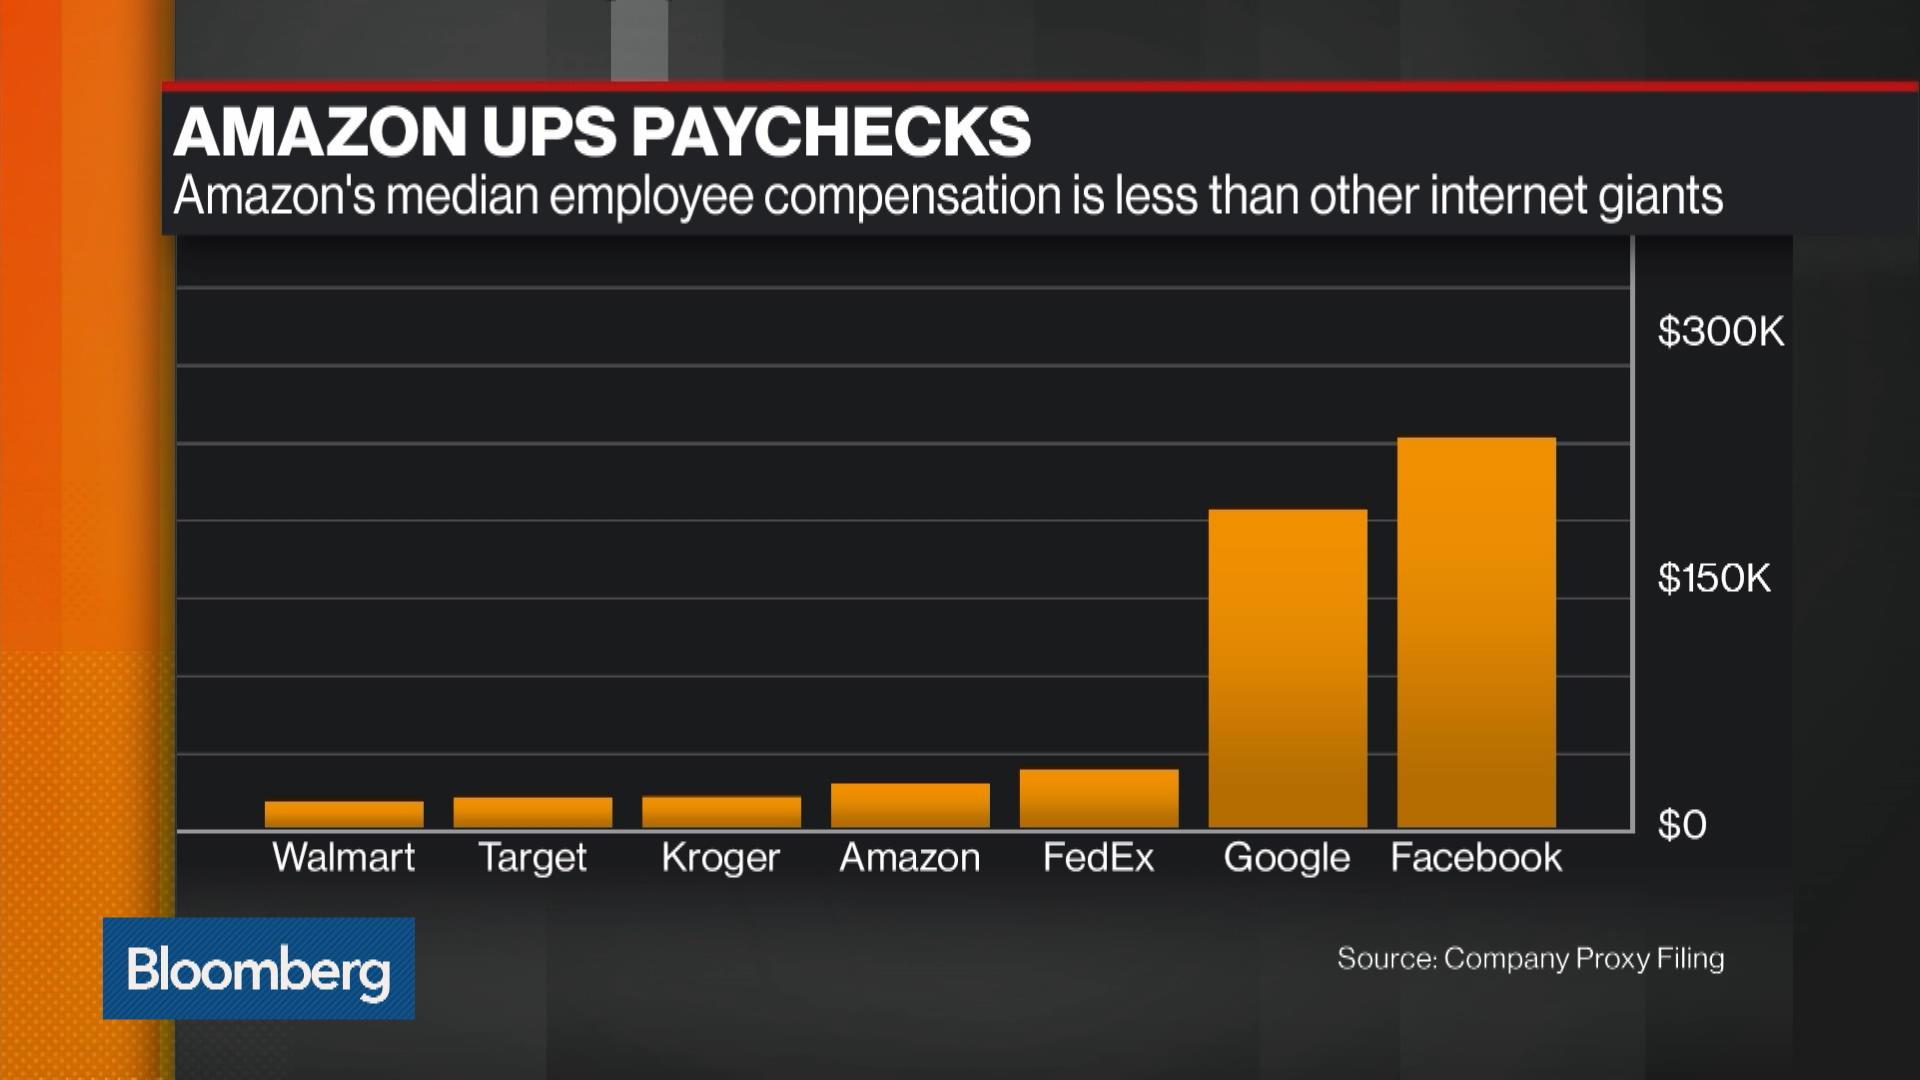 Amazon Eliminating Bonuses, Stock Awards to Help Pay for